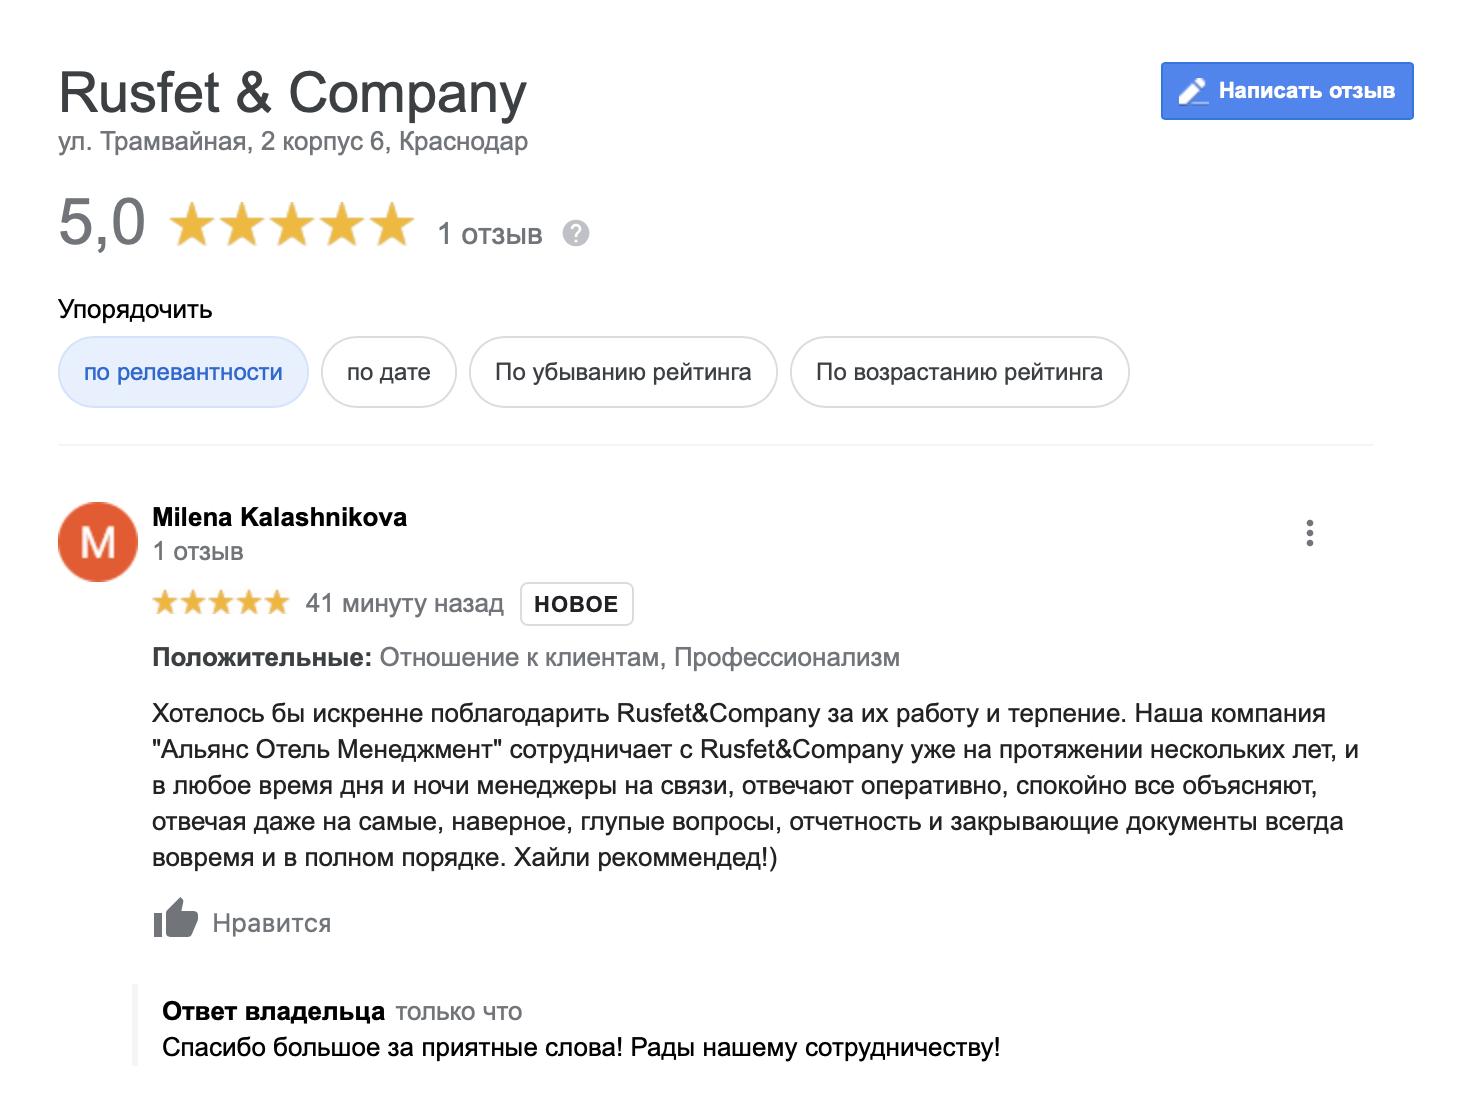 Отзыв в Гугле о Rusfet & Company (Русфет и Компания)